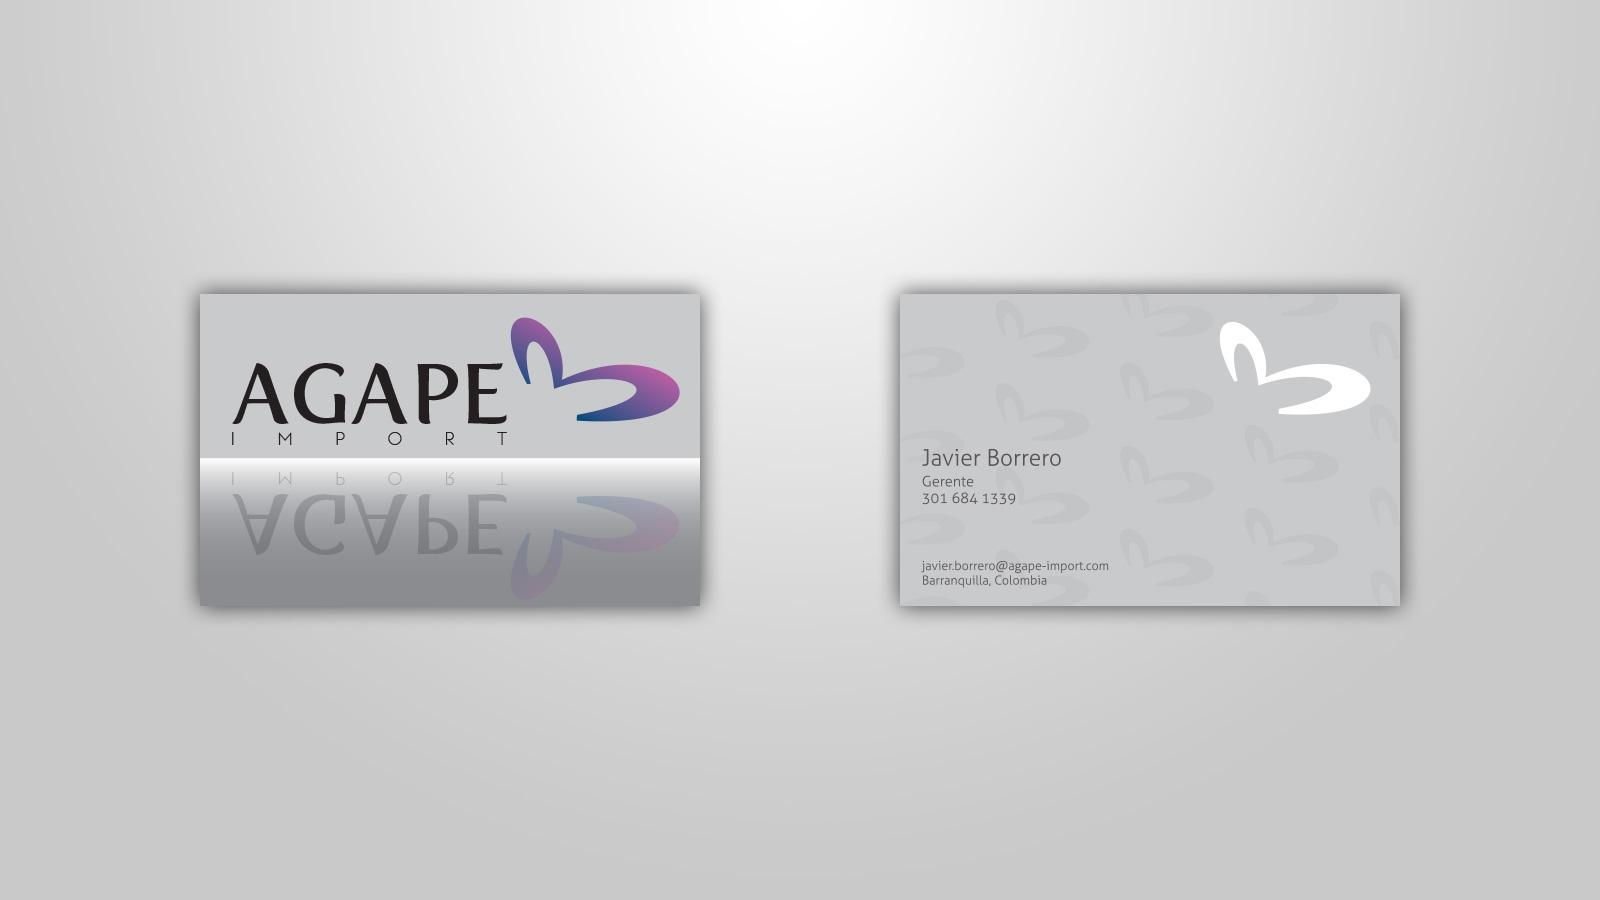 sublime-digital_agape-import-identity-06